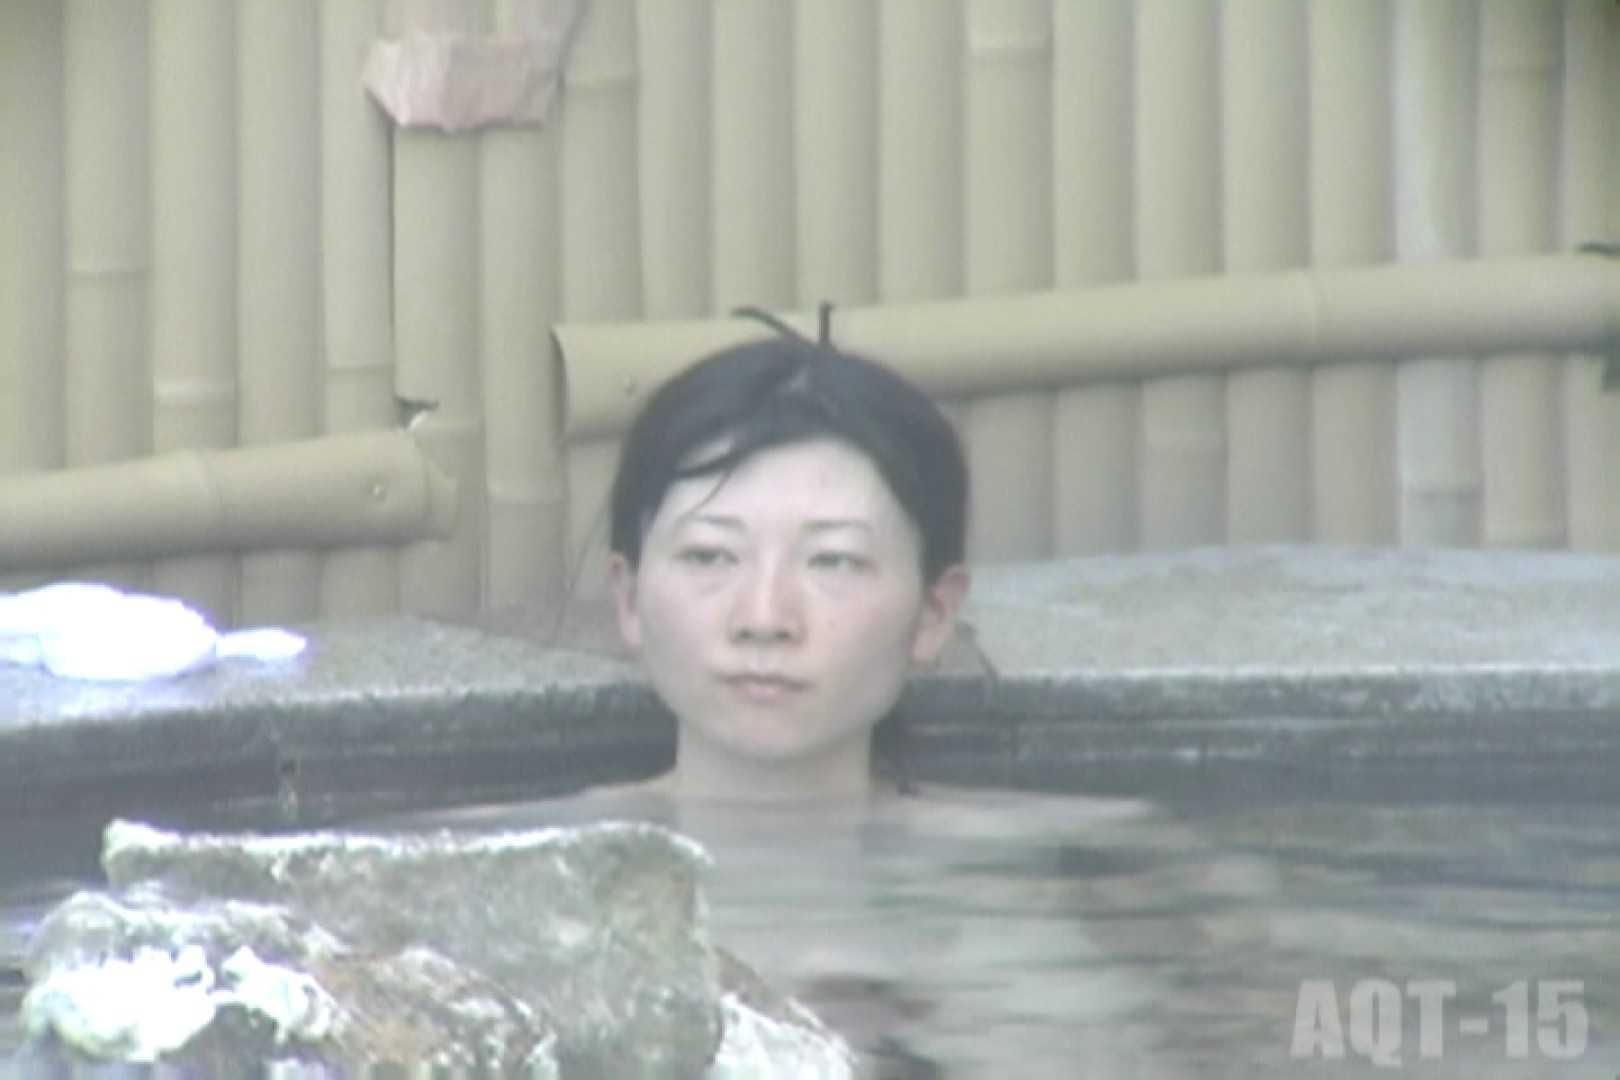 Aquaな露天風呂Vol.835 盗撮シリーズ   露天風呂編  92PIX 47